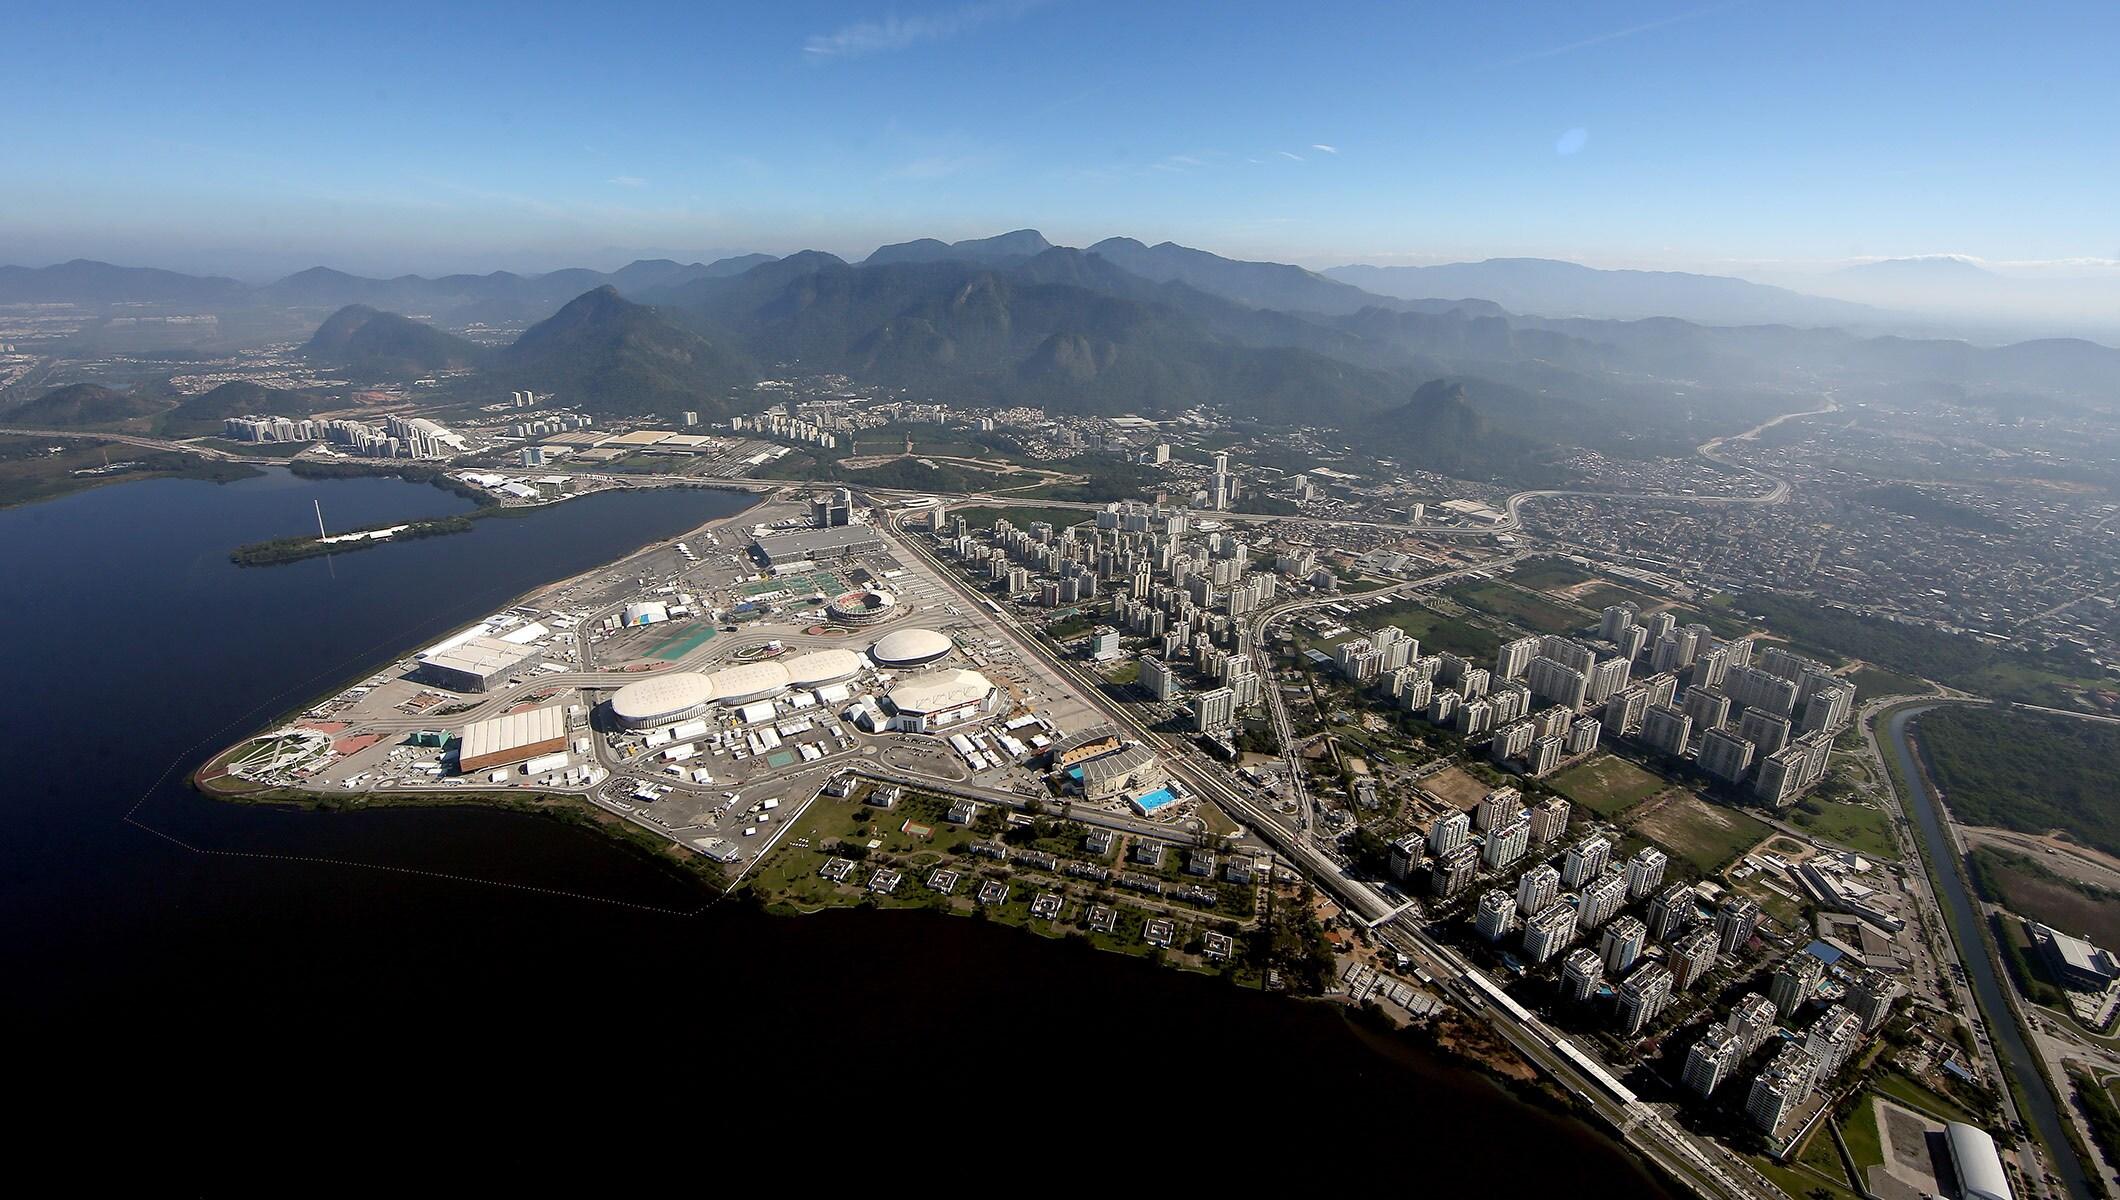 Rio 2016 - Olympic park